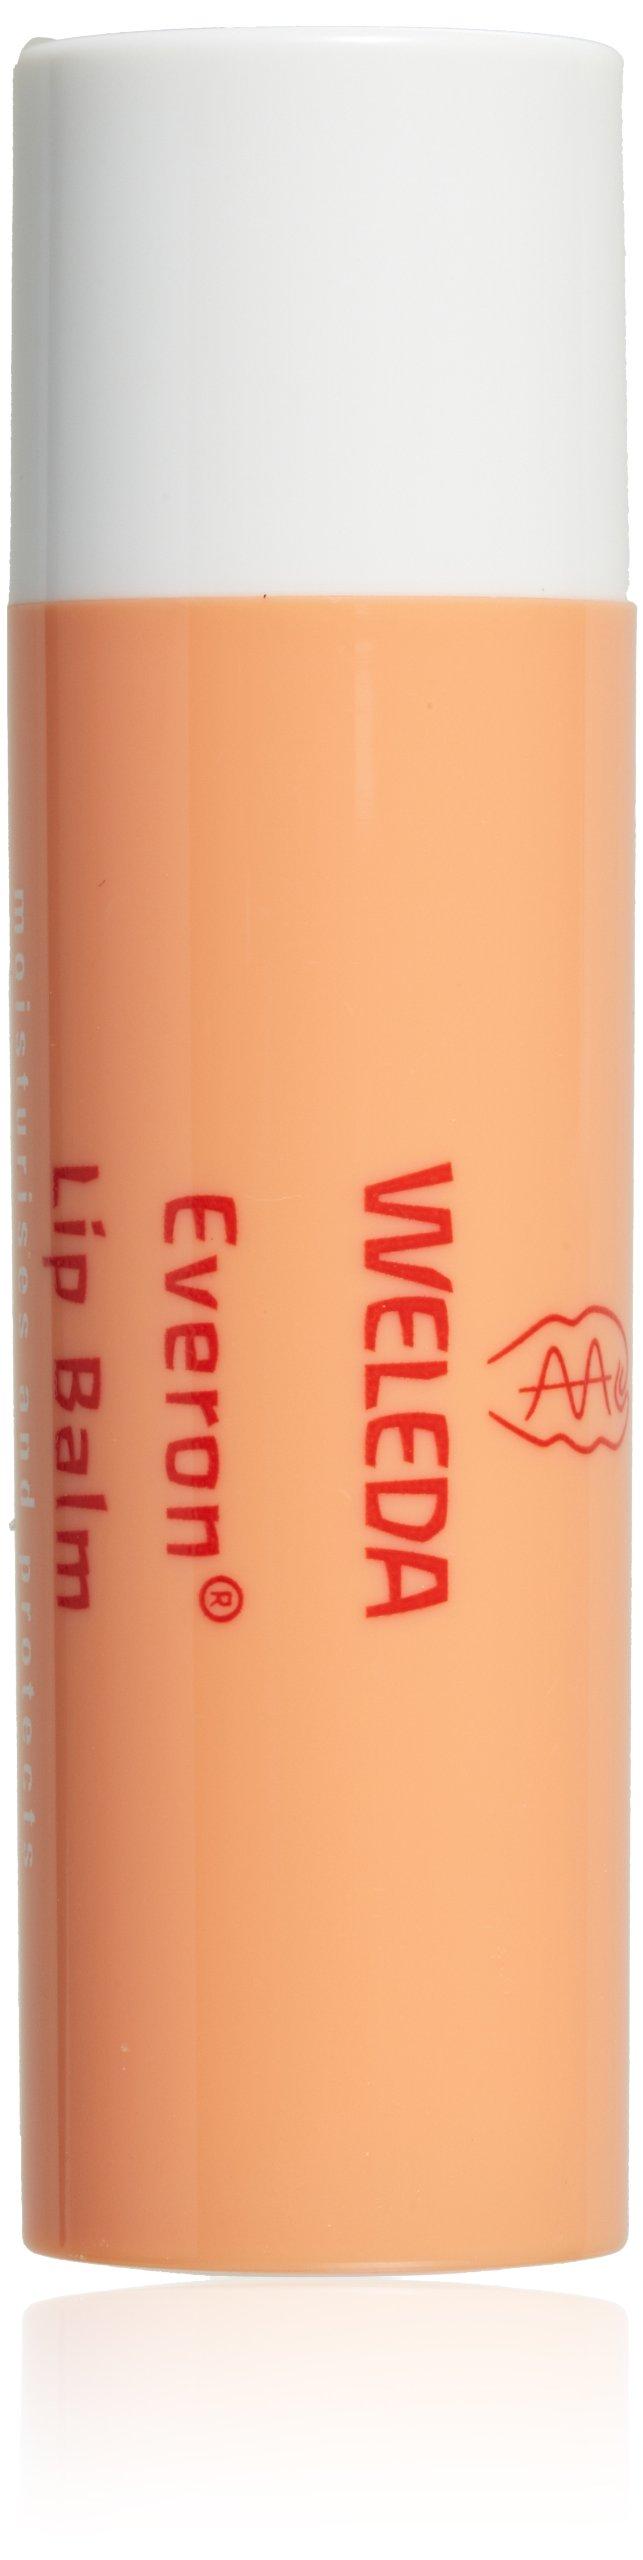 Weleda Everon Lip Balm, 0.17 Ounce (Pack of 3) by Weleda (Image #1)